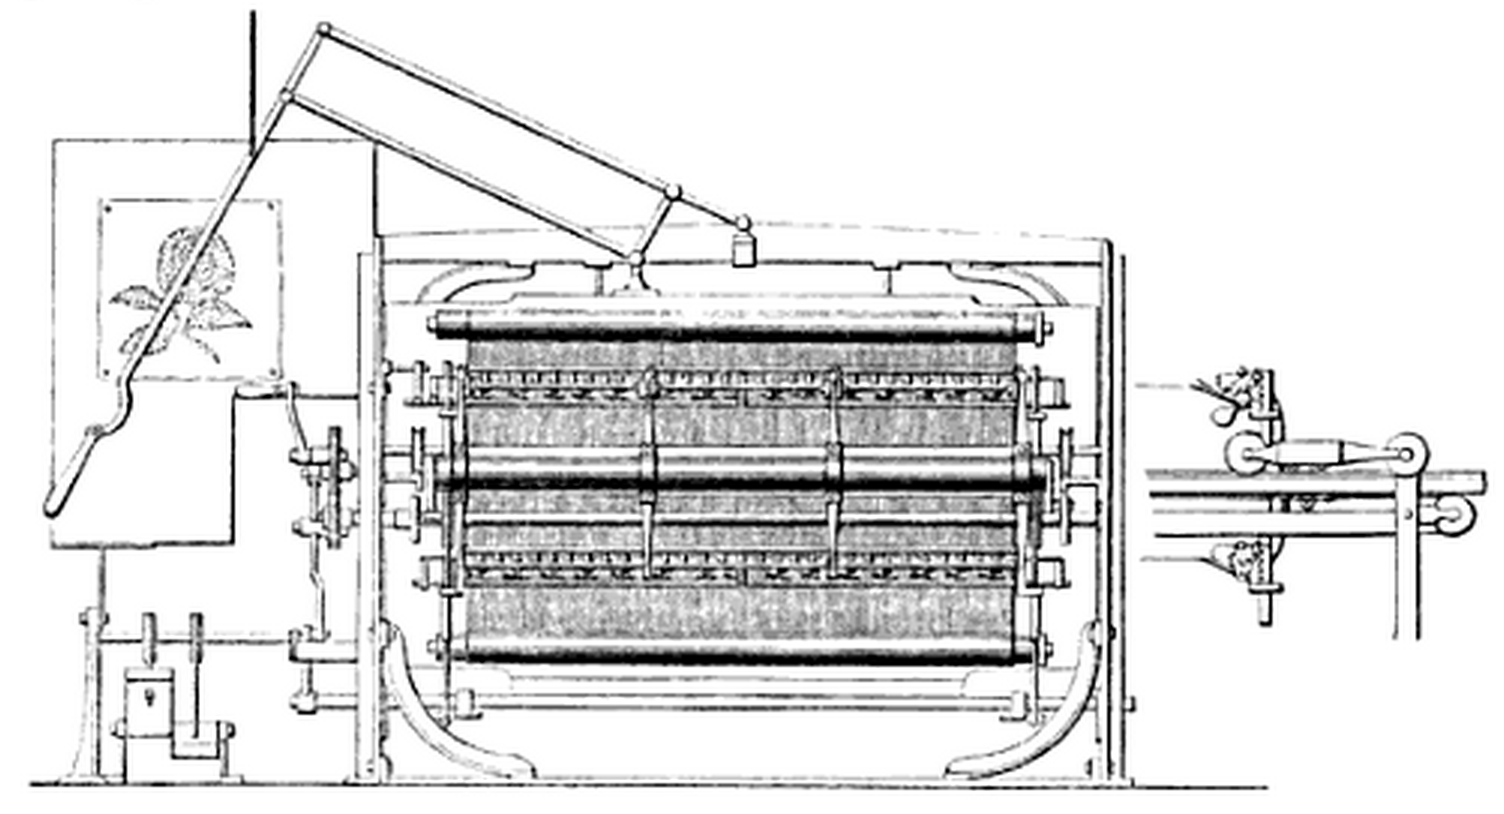 Schwabe's Jacquard Loom